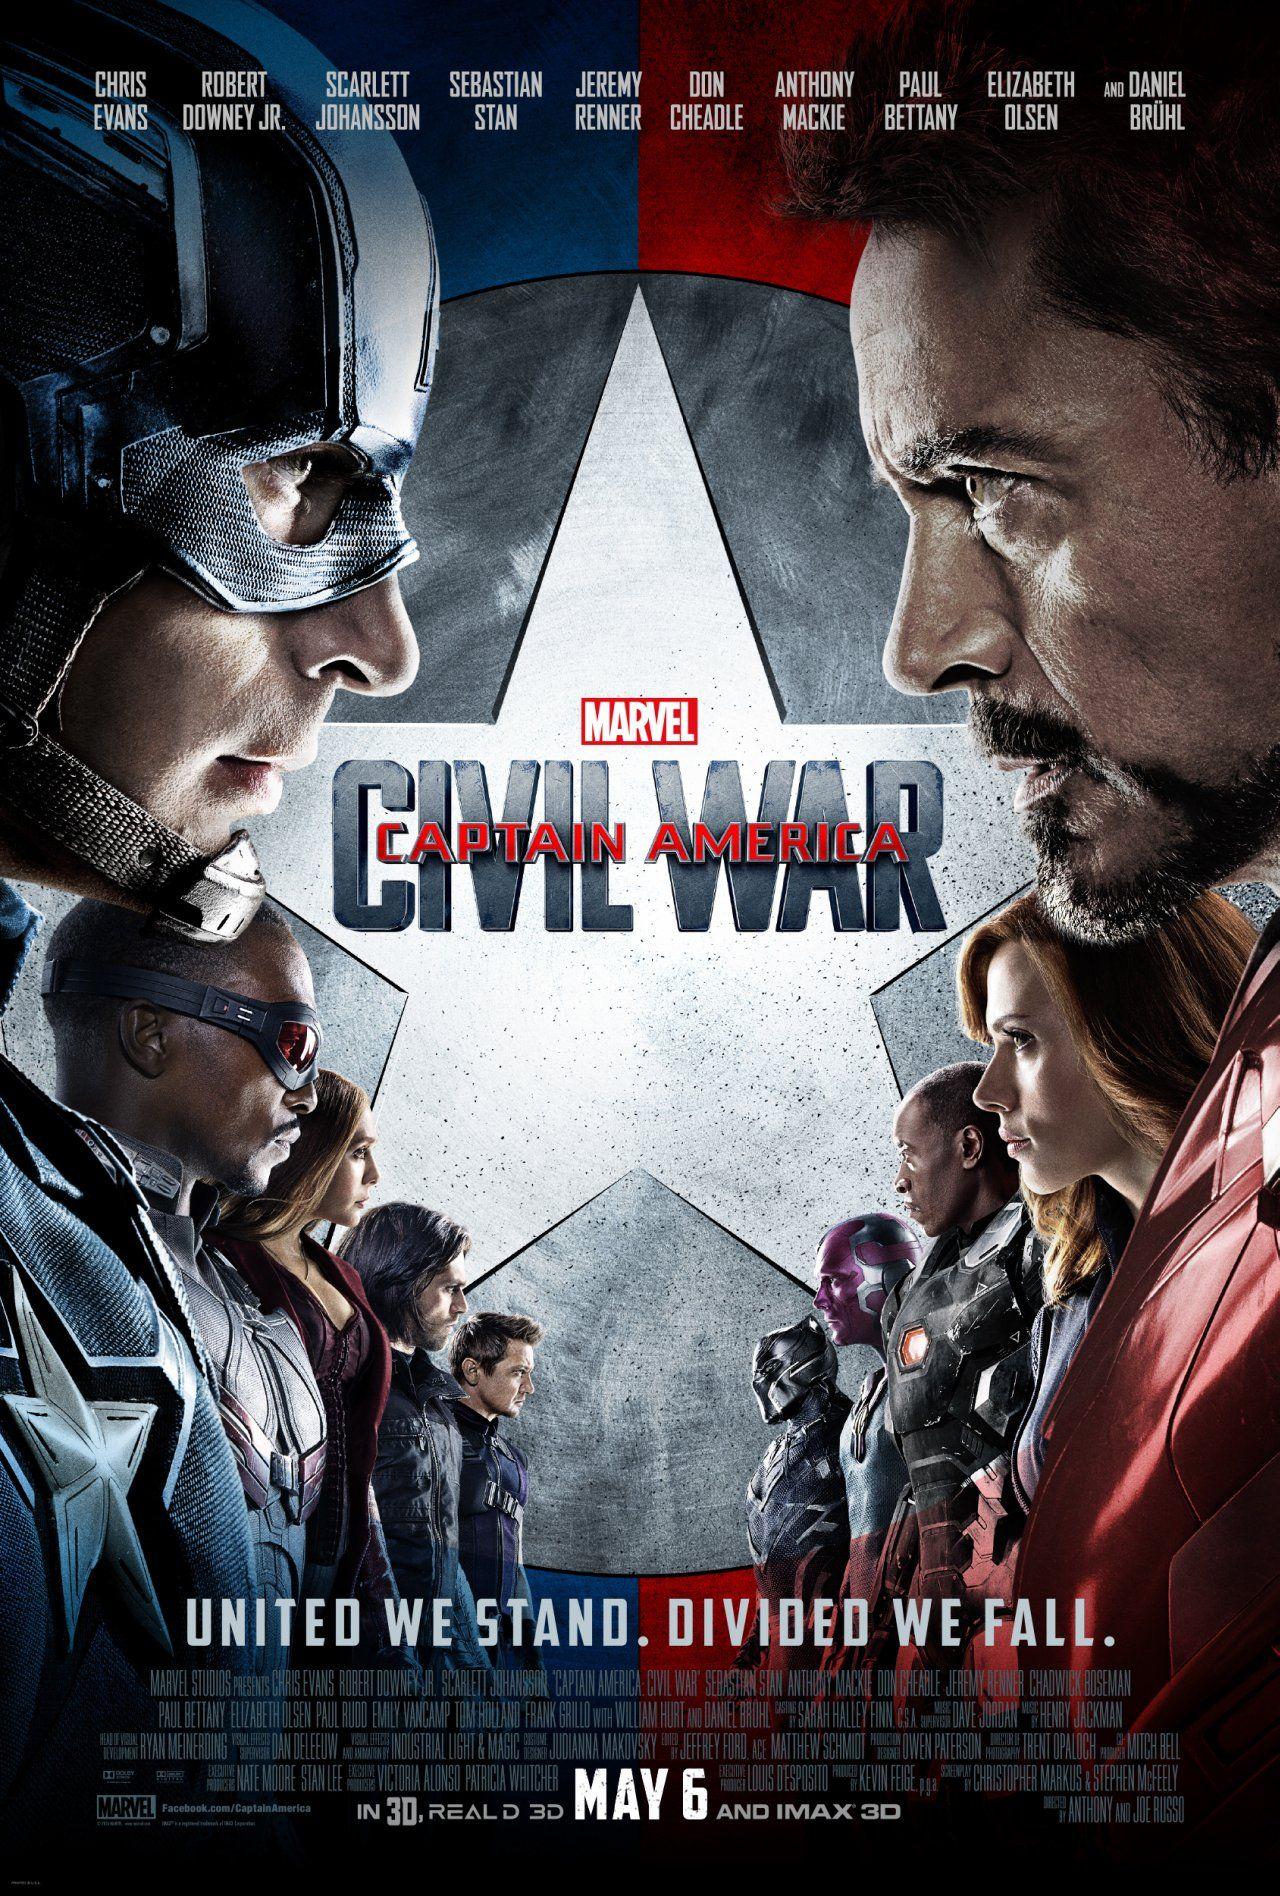 New Spider Man Costume Revealed Superherohype Captain America Civil War Poster Captain America Civil War Movie Marvel Captain America Civil War